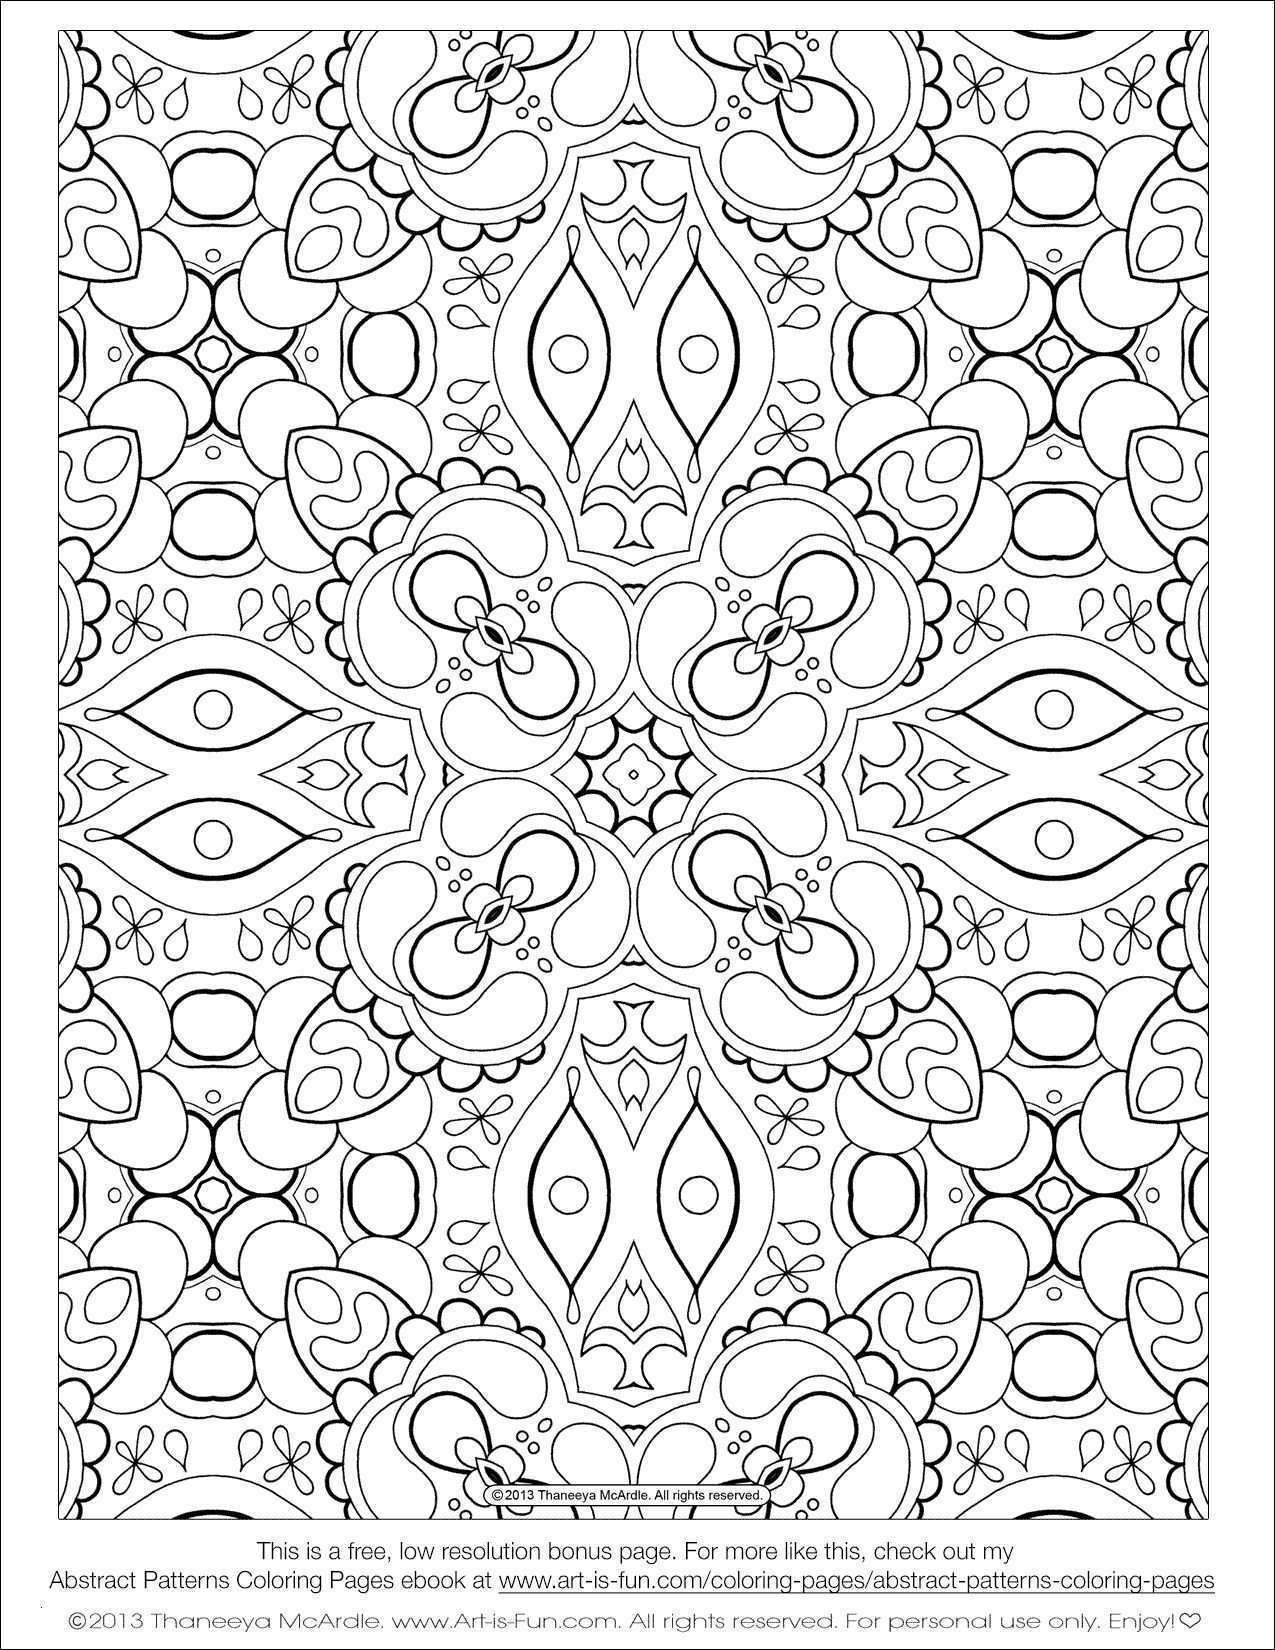 Ausmalbilder Mandala Herzen Inspirierend Herzen Mit Pfeil Zum Ausmalen Ideen – Ausmalbilder Ideen Stock